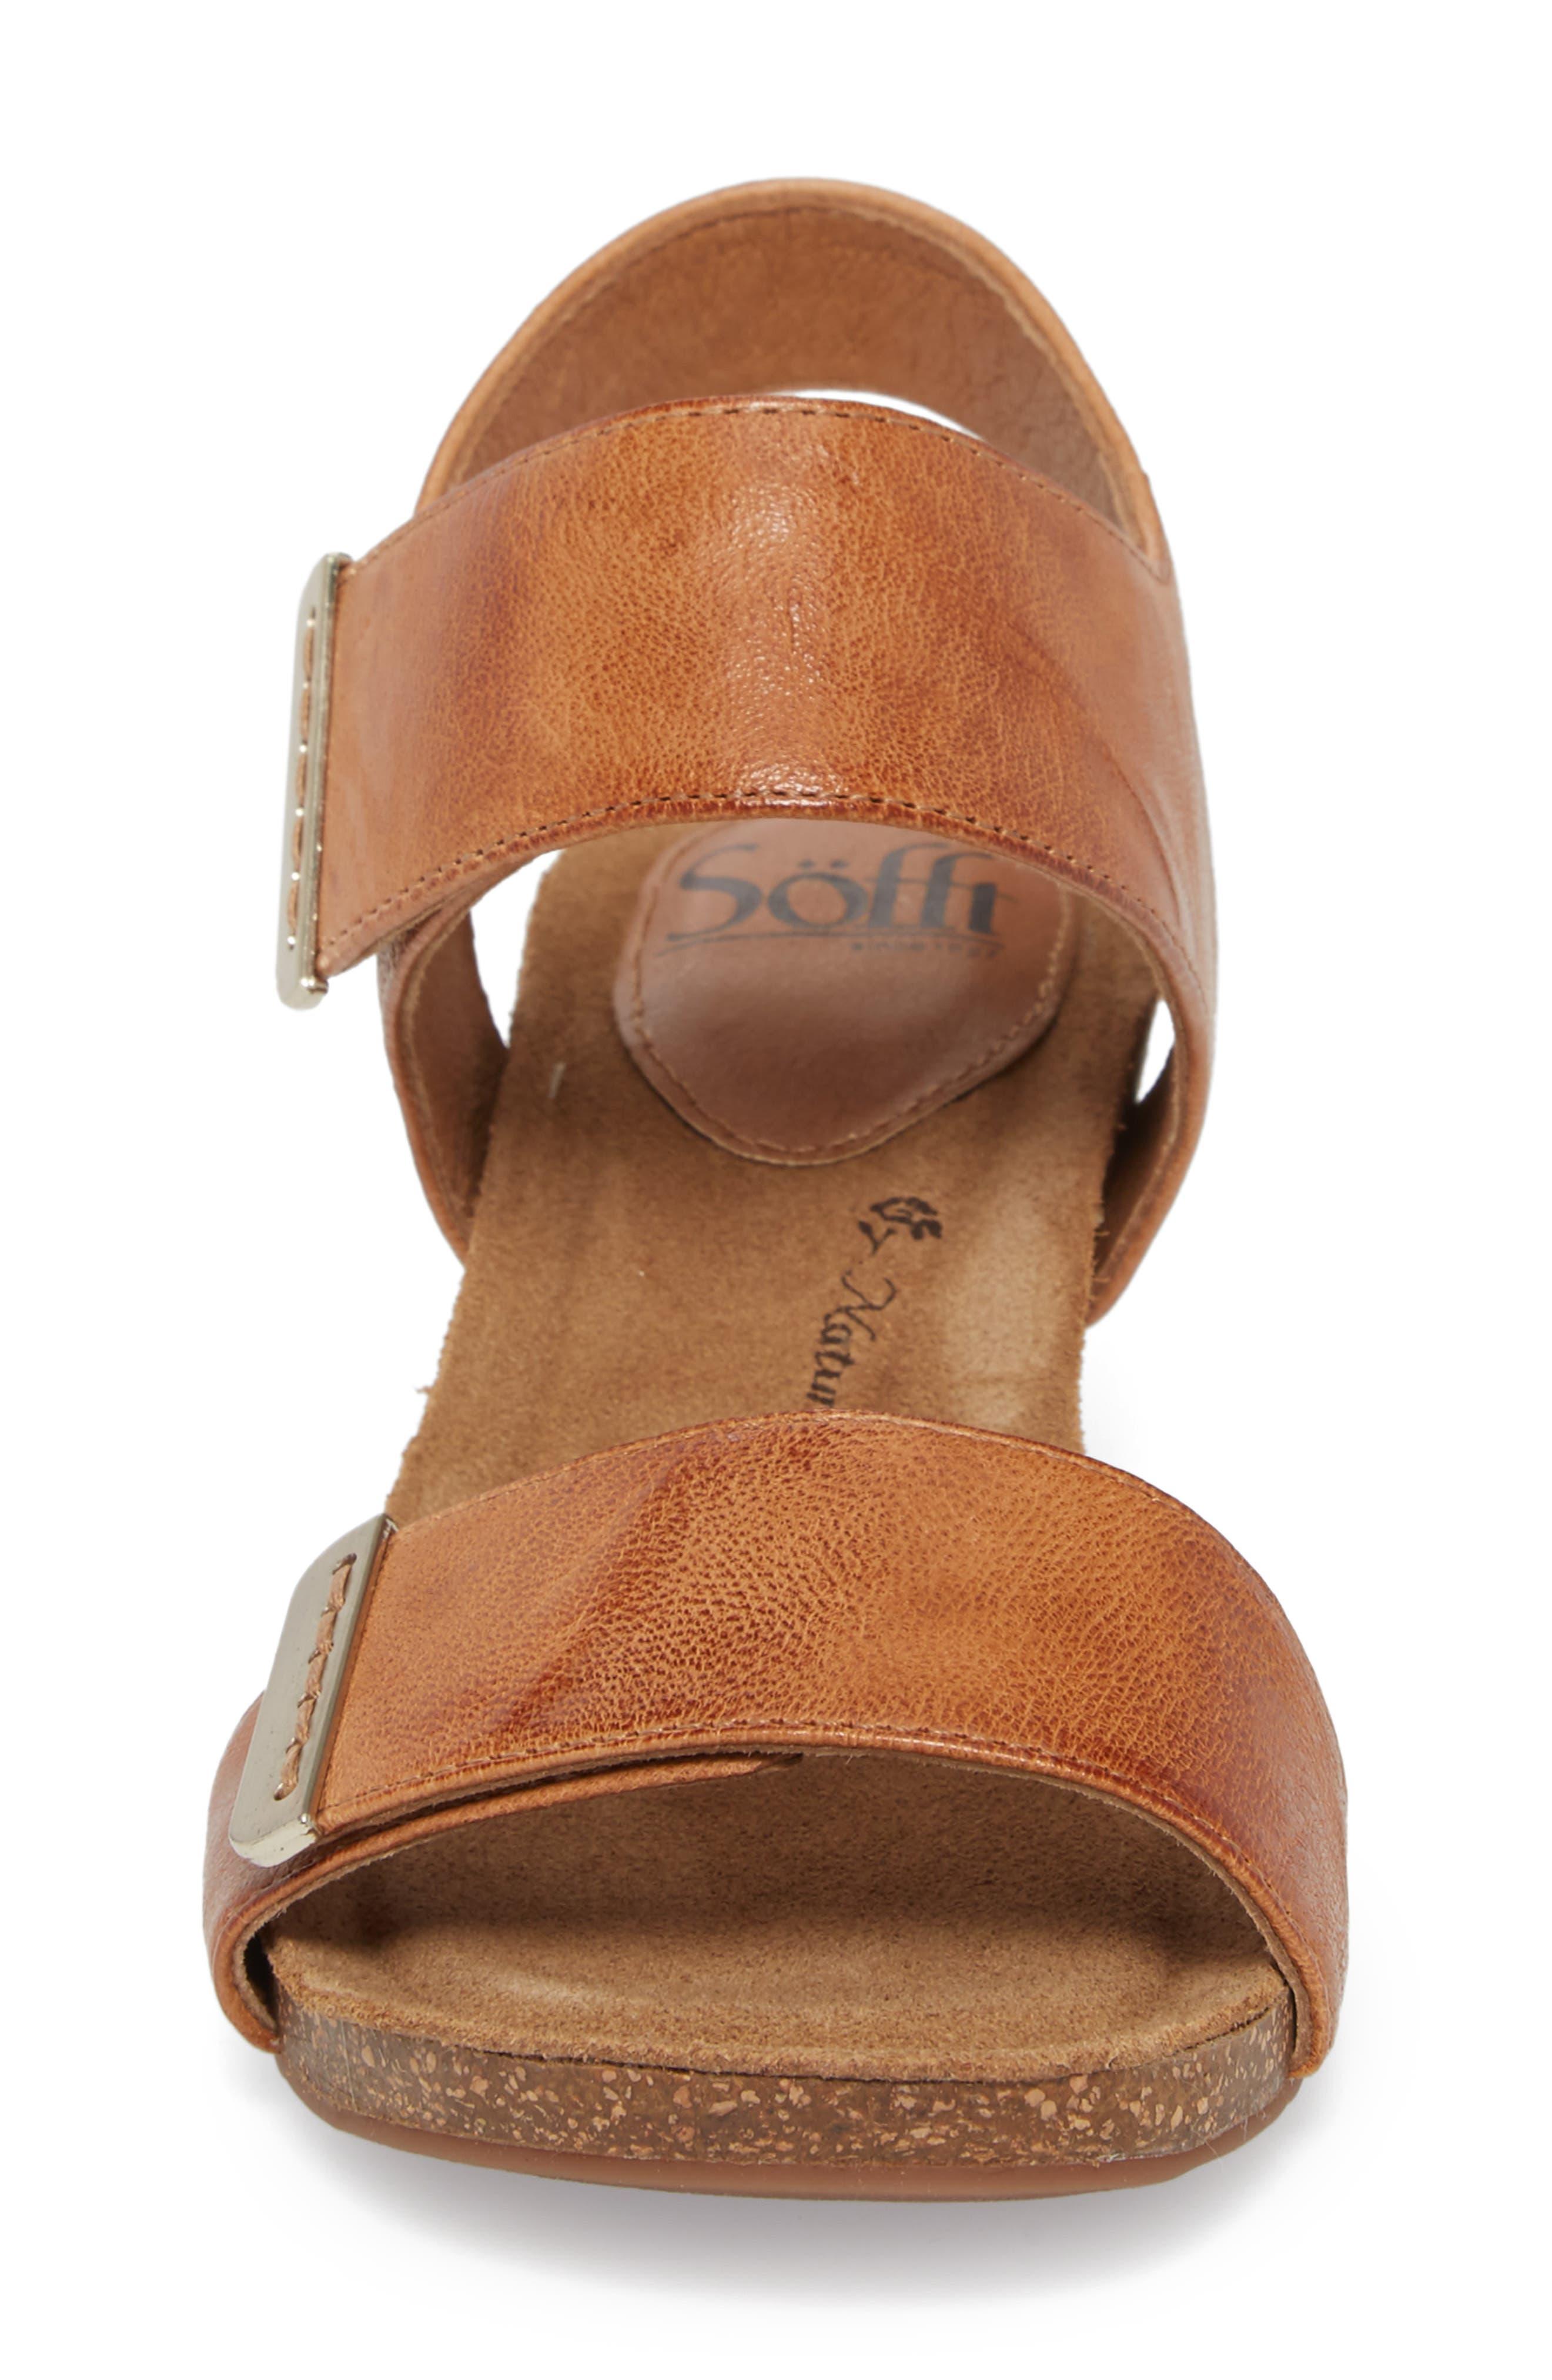 Verdi Wedge Sandal,                             Alternate thumbnail 4, color,                             Luggage Leather